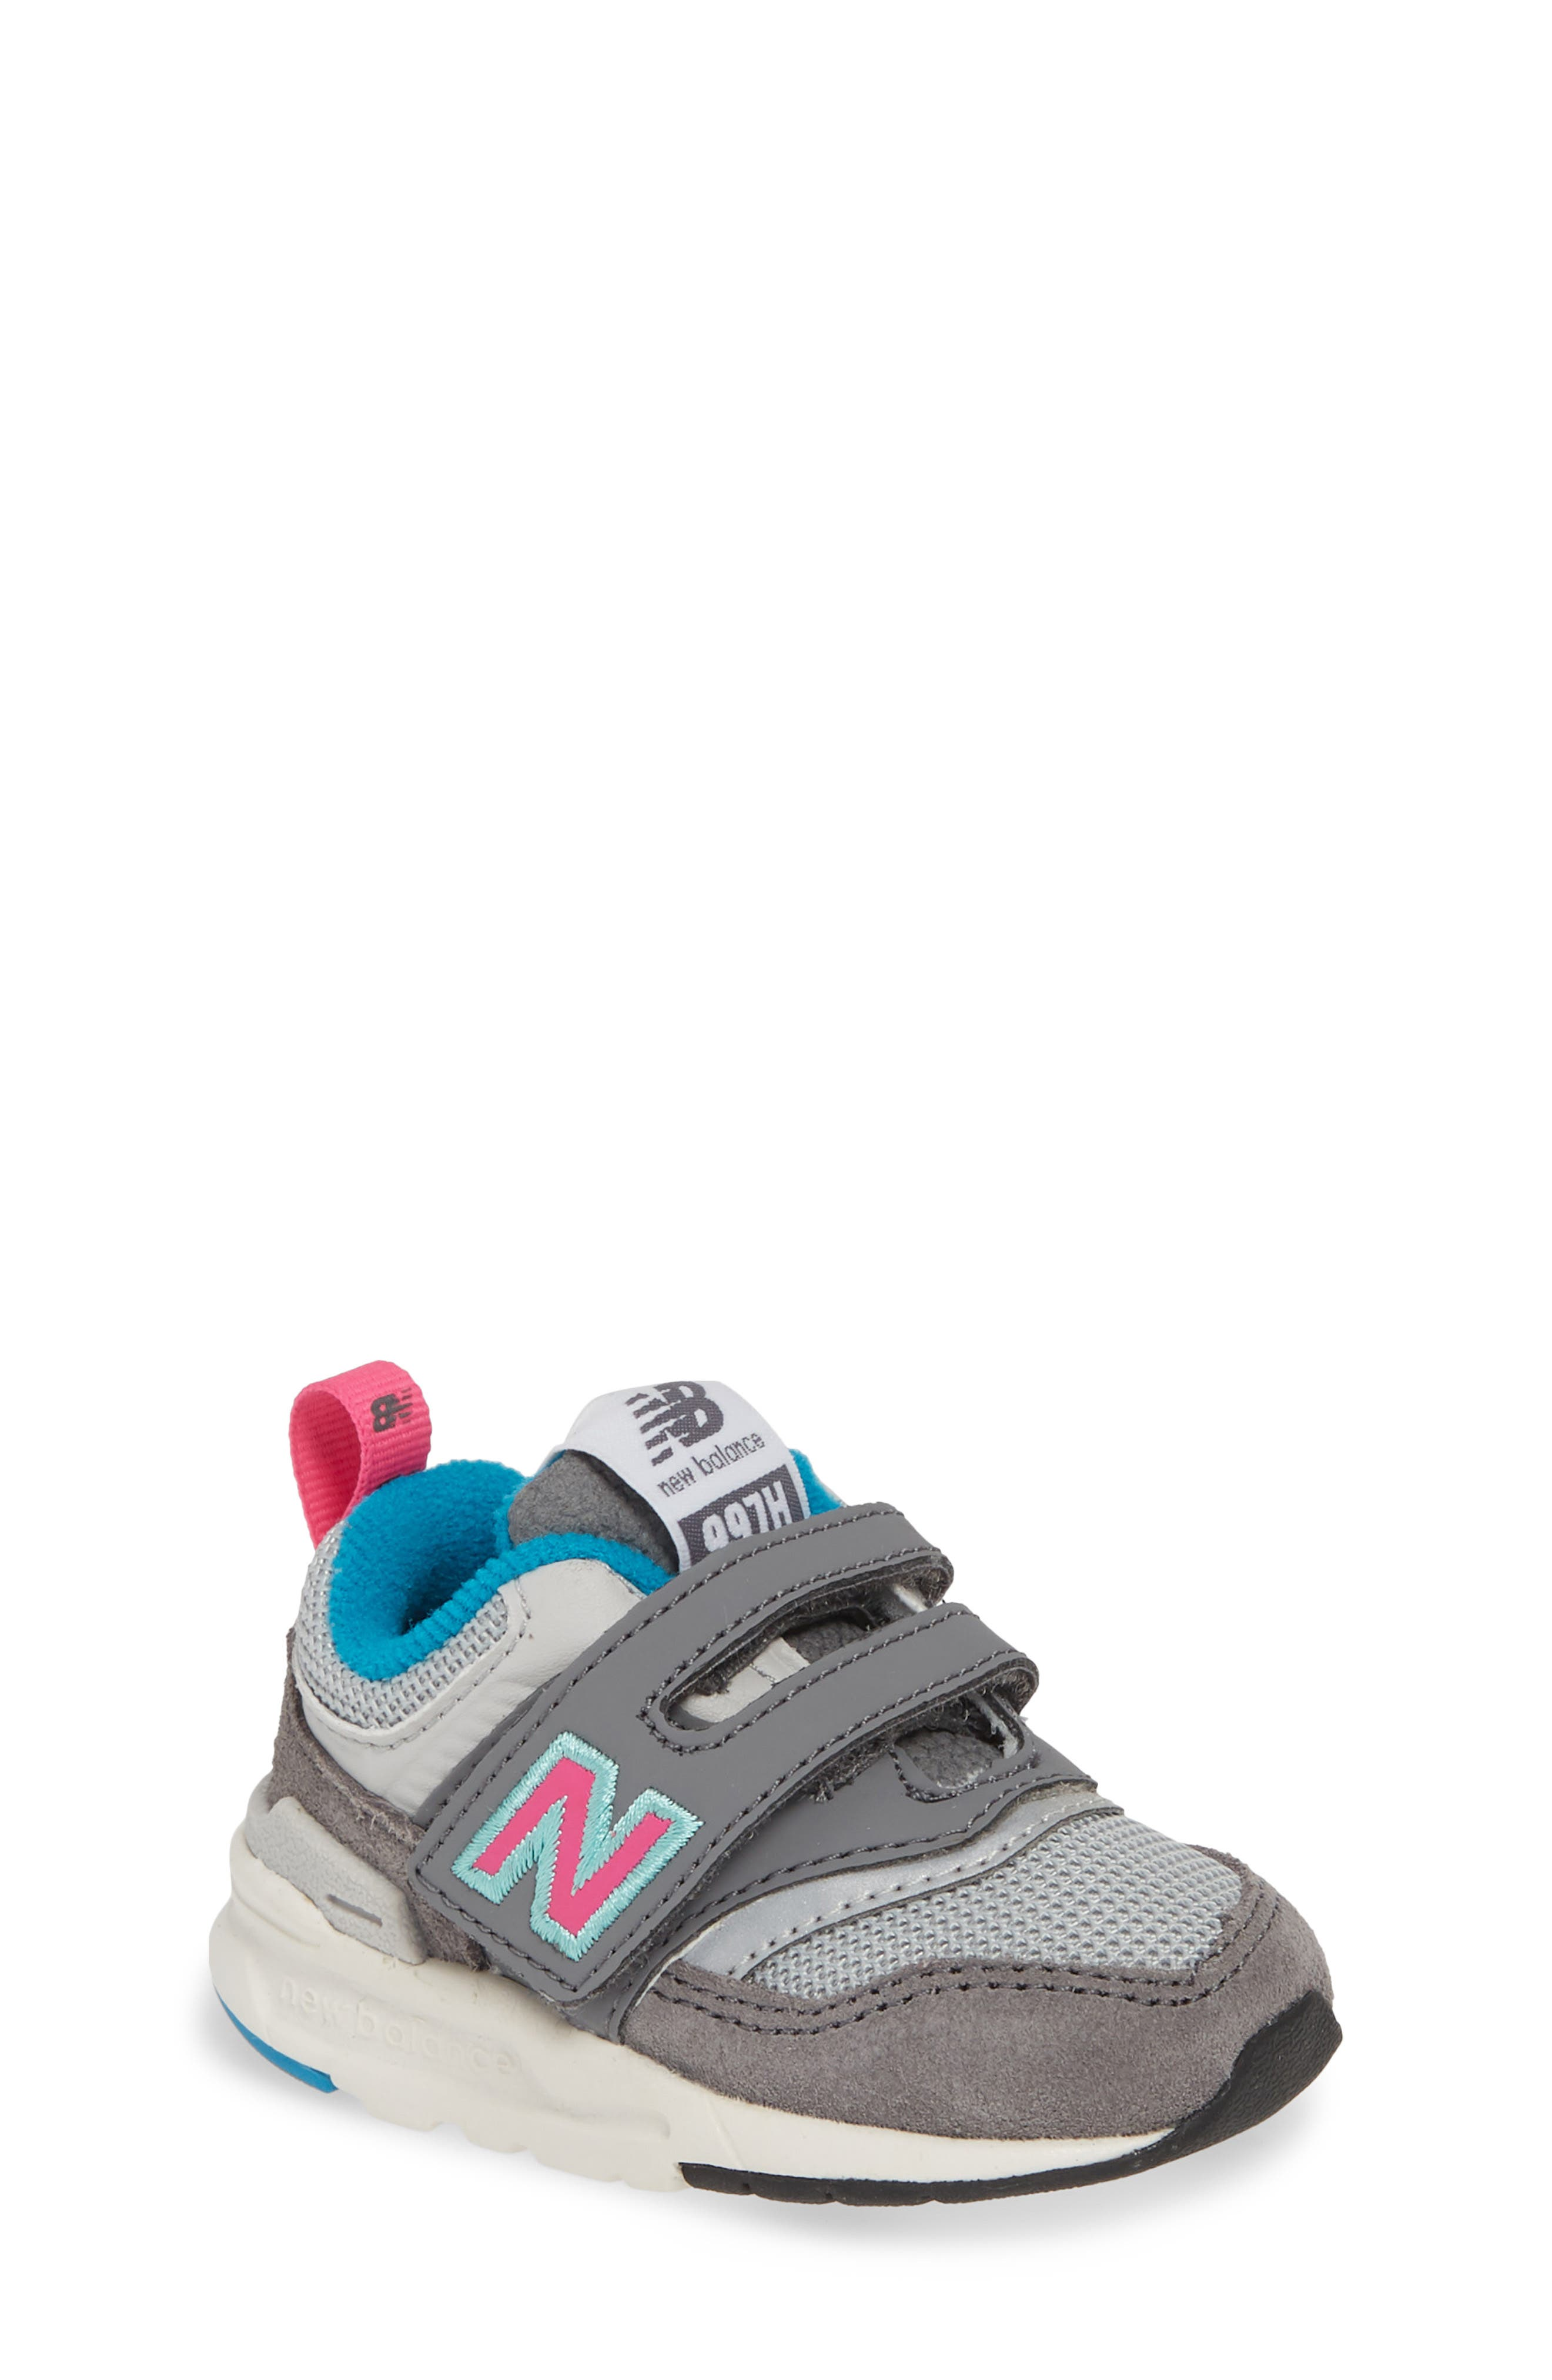 038d02ab3c91 Toddler Girls  New Balance Shoes (Sizes 7.5-12)